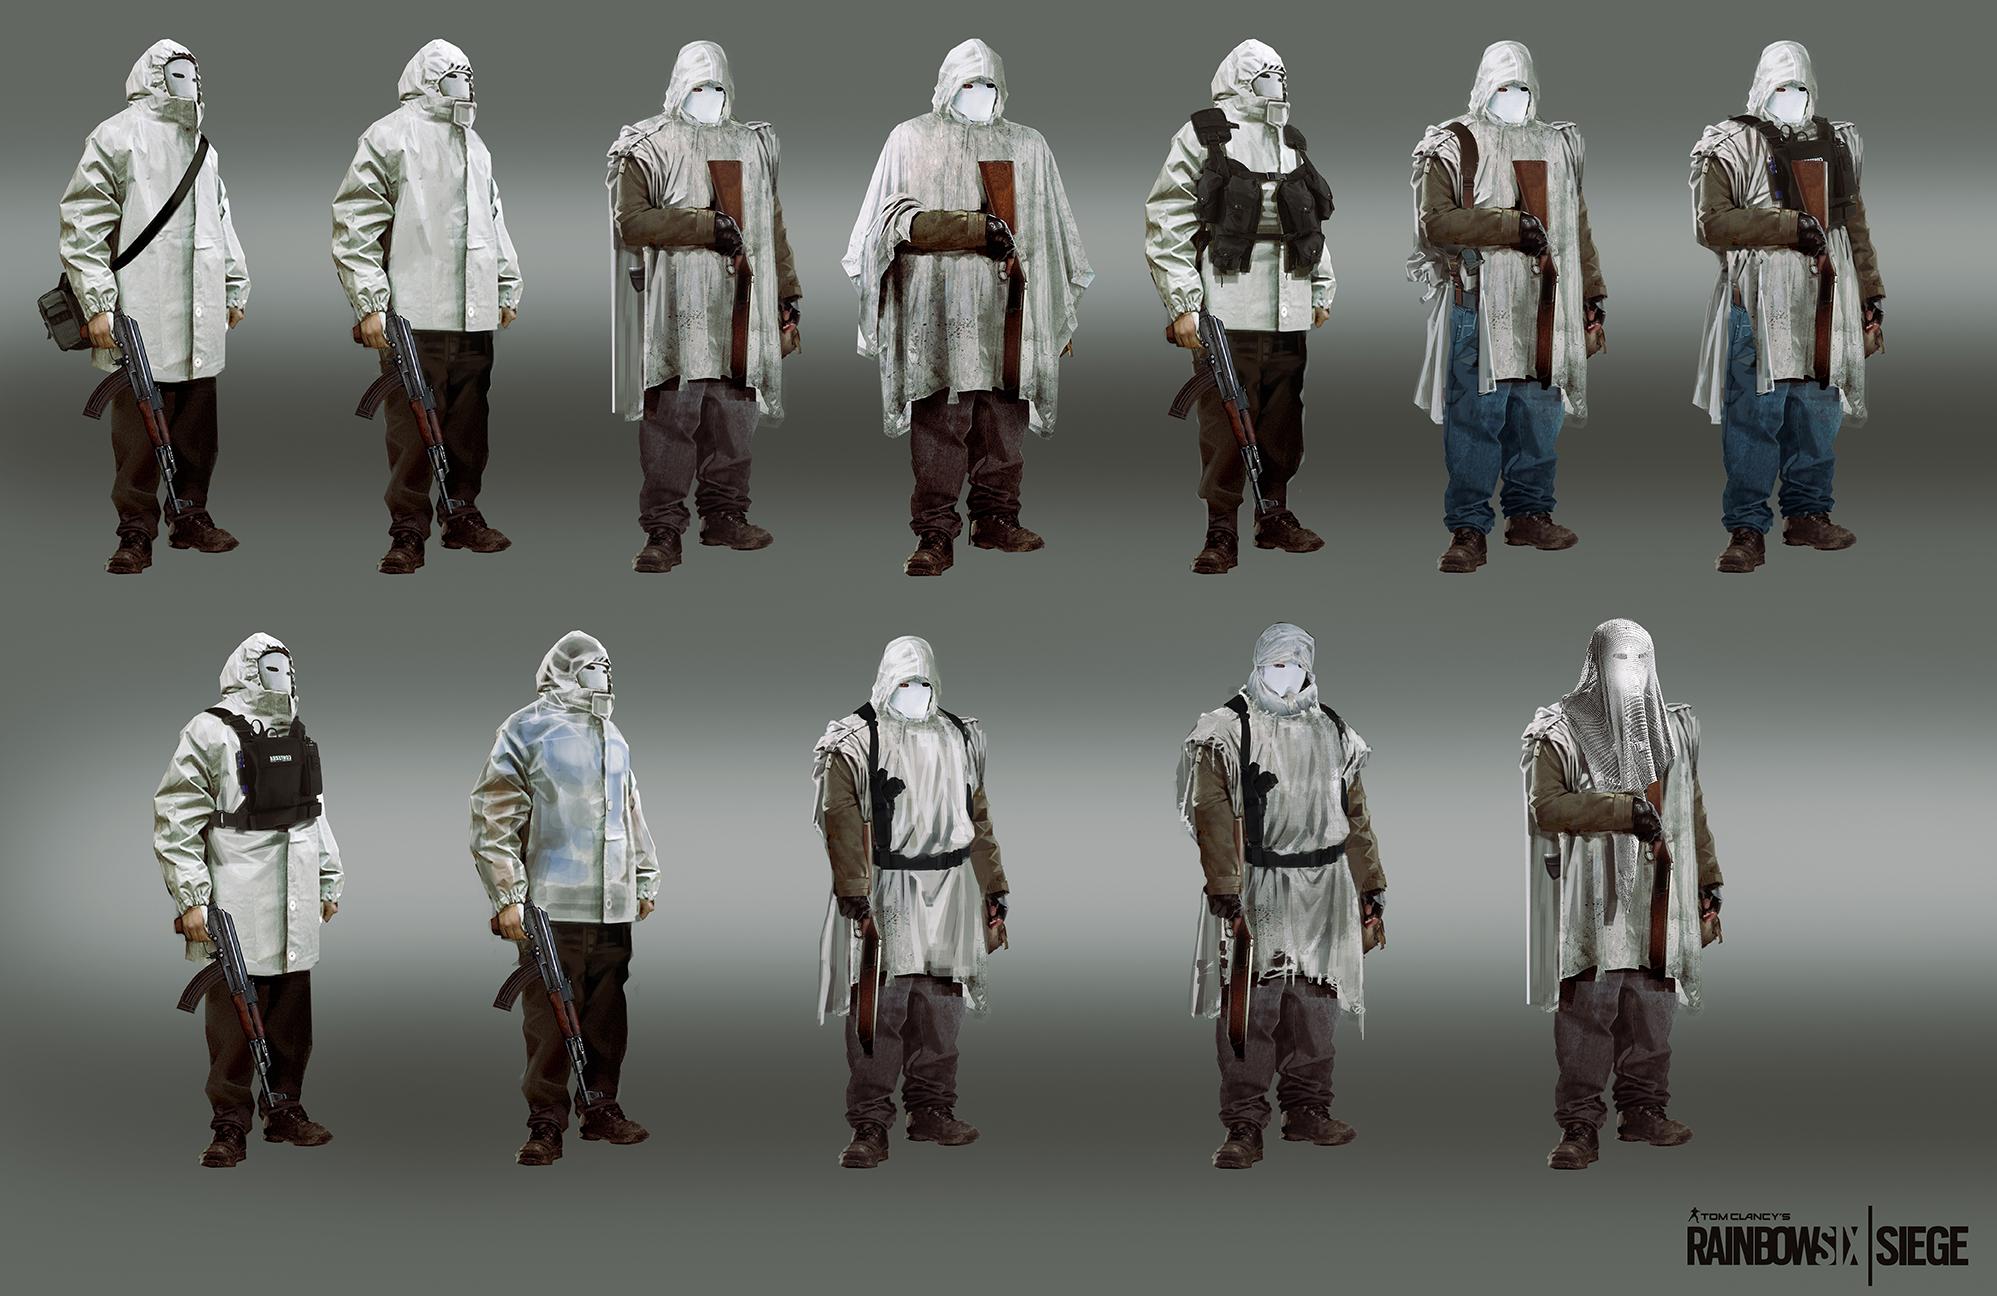 Rainbow Six Siege White Mask: Image - White Masks Concept Design.jpg